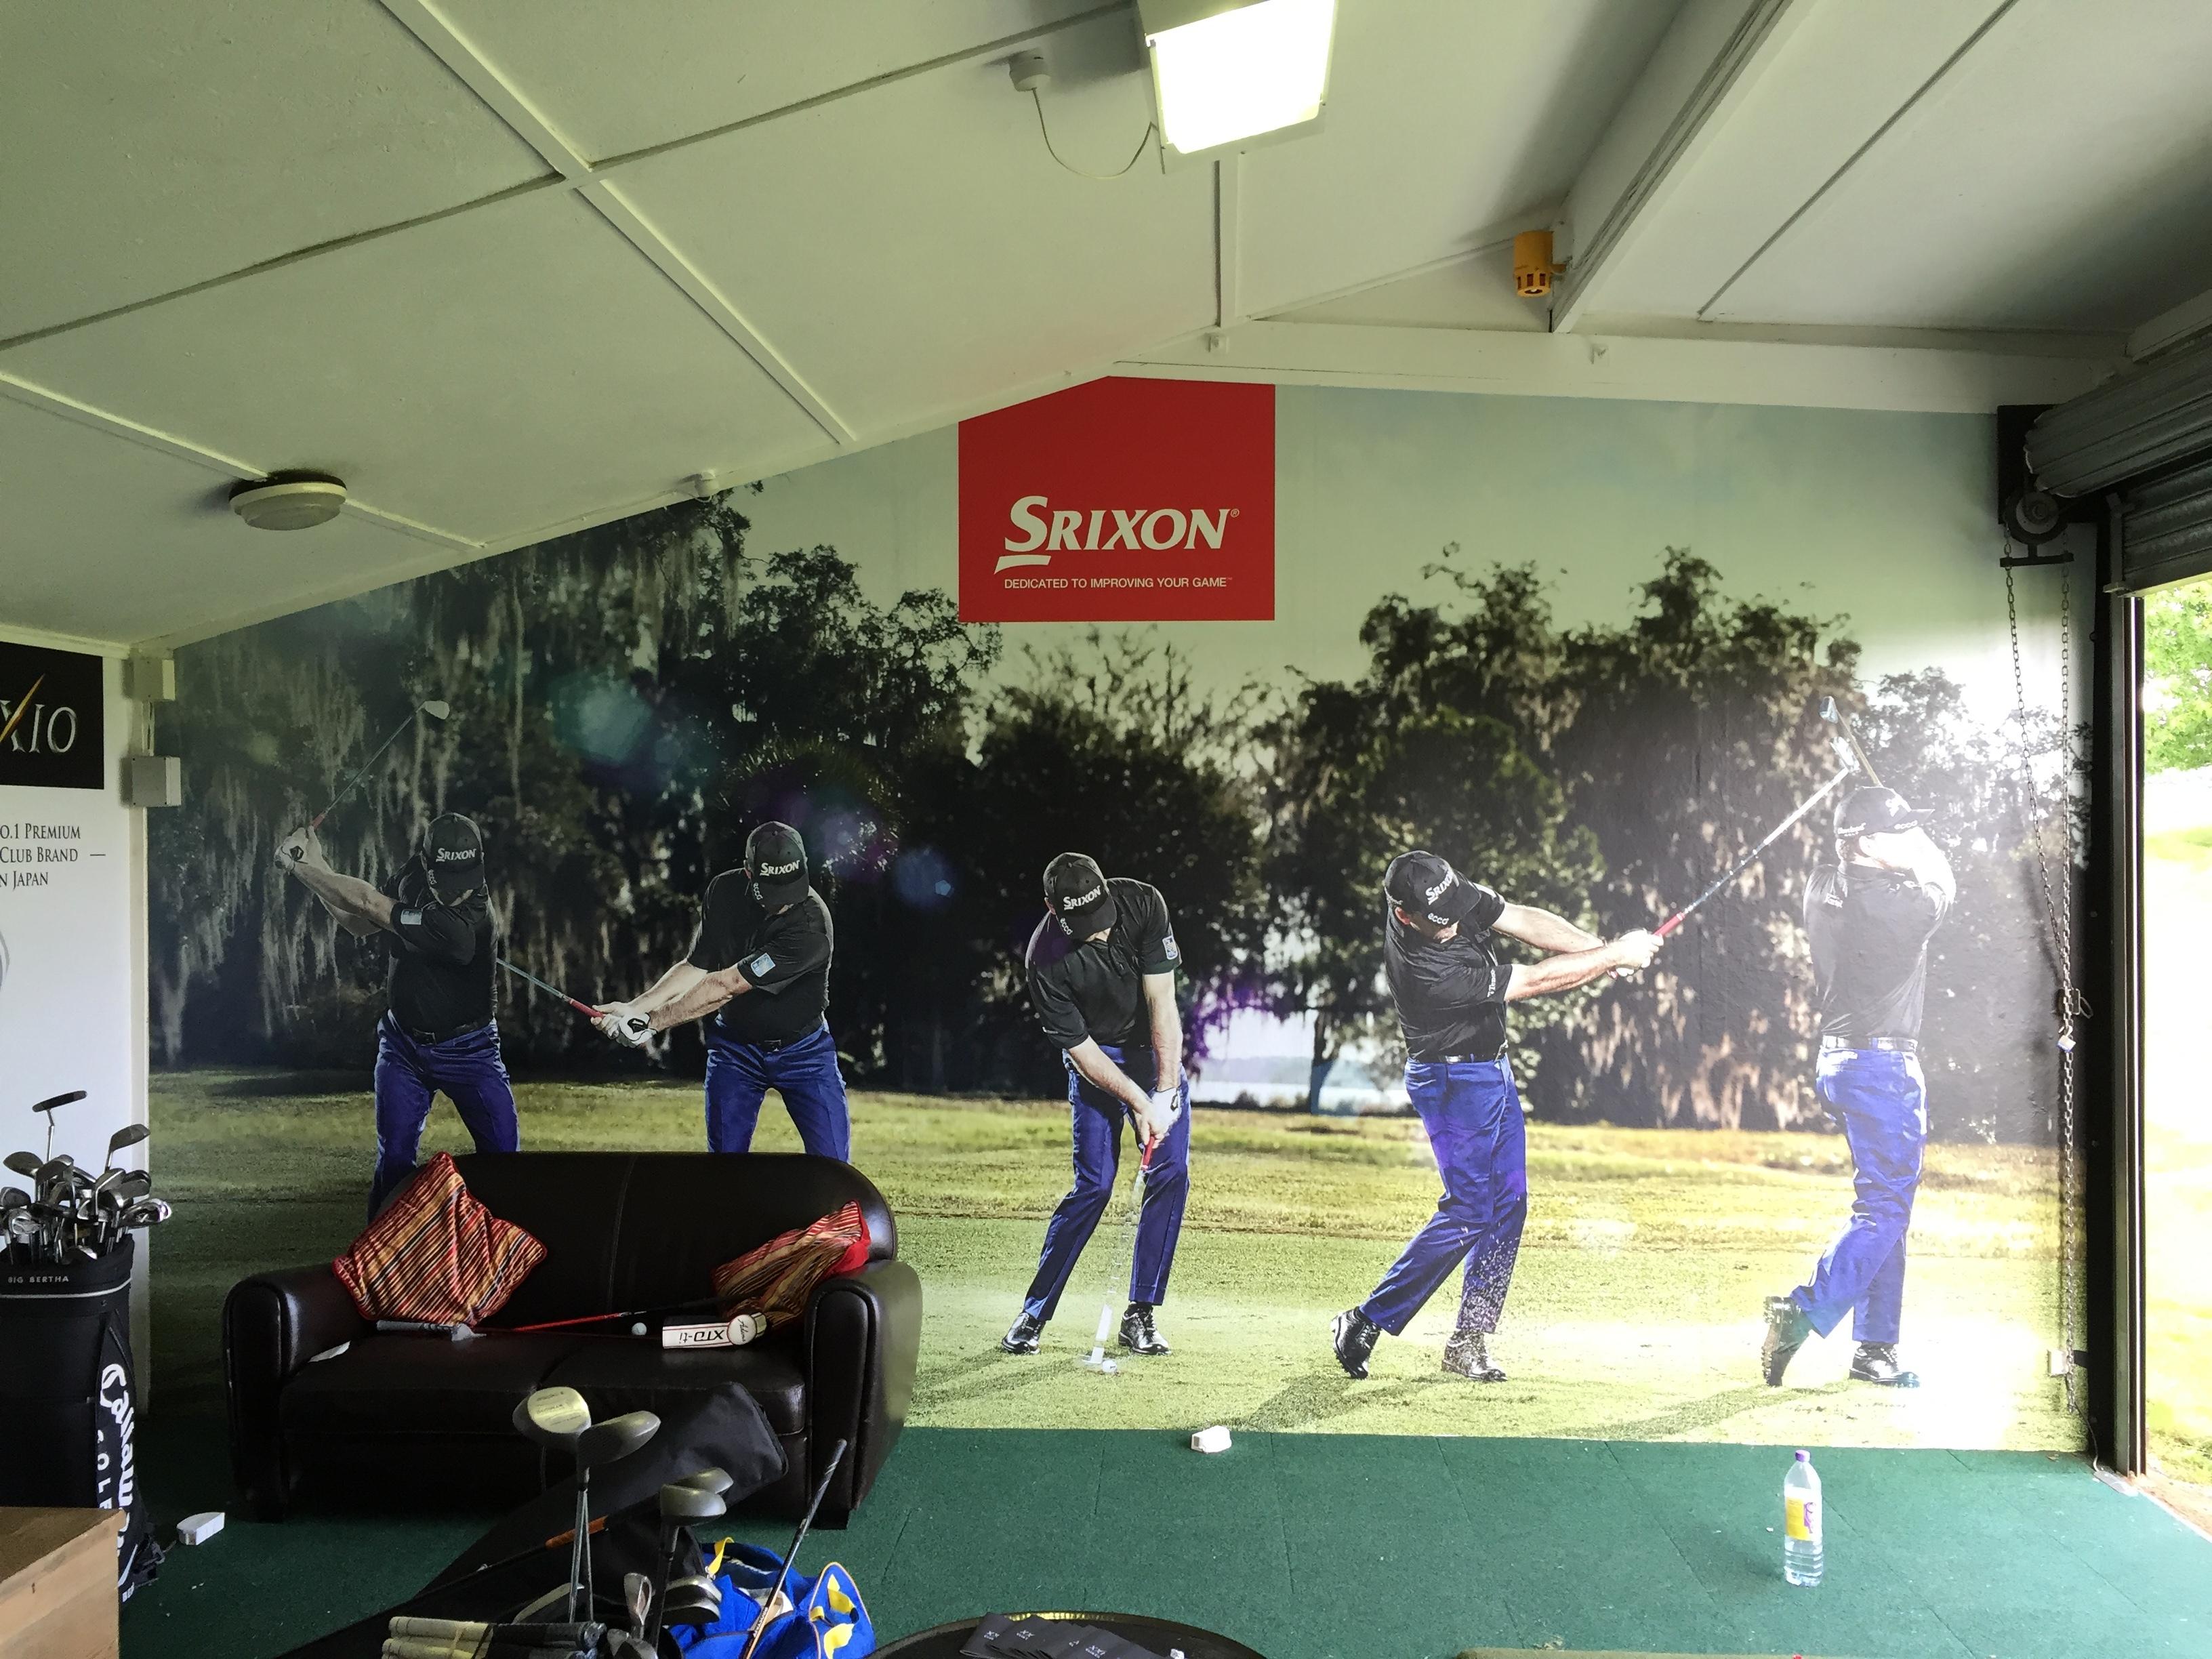 Self adhesive wall wrap srixon fitting room b2b graphics for Room wraps